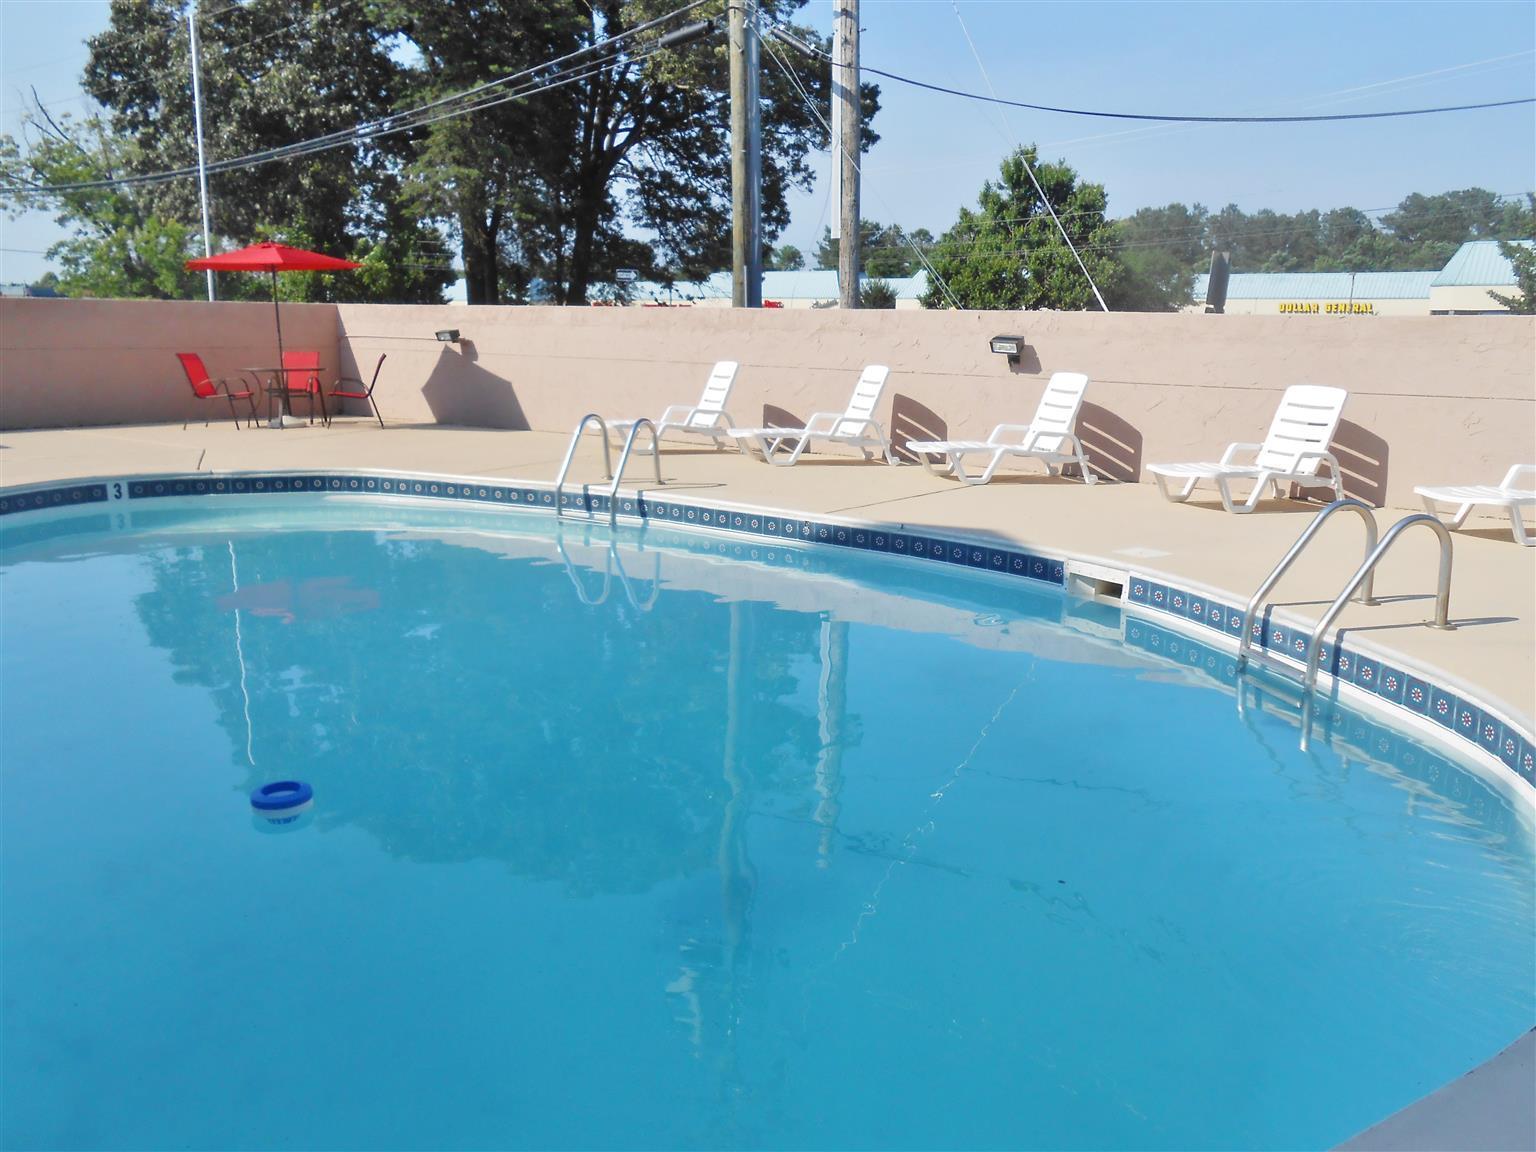 Americas Best Value Inn Williamsburg Lightfoot Area Photo Swimming Pool